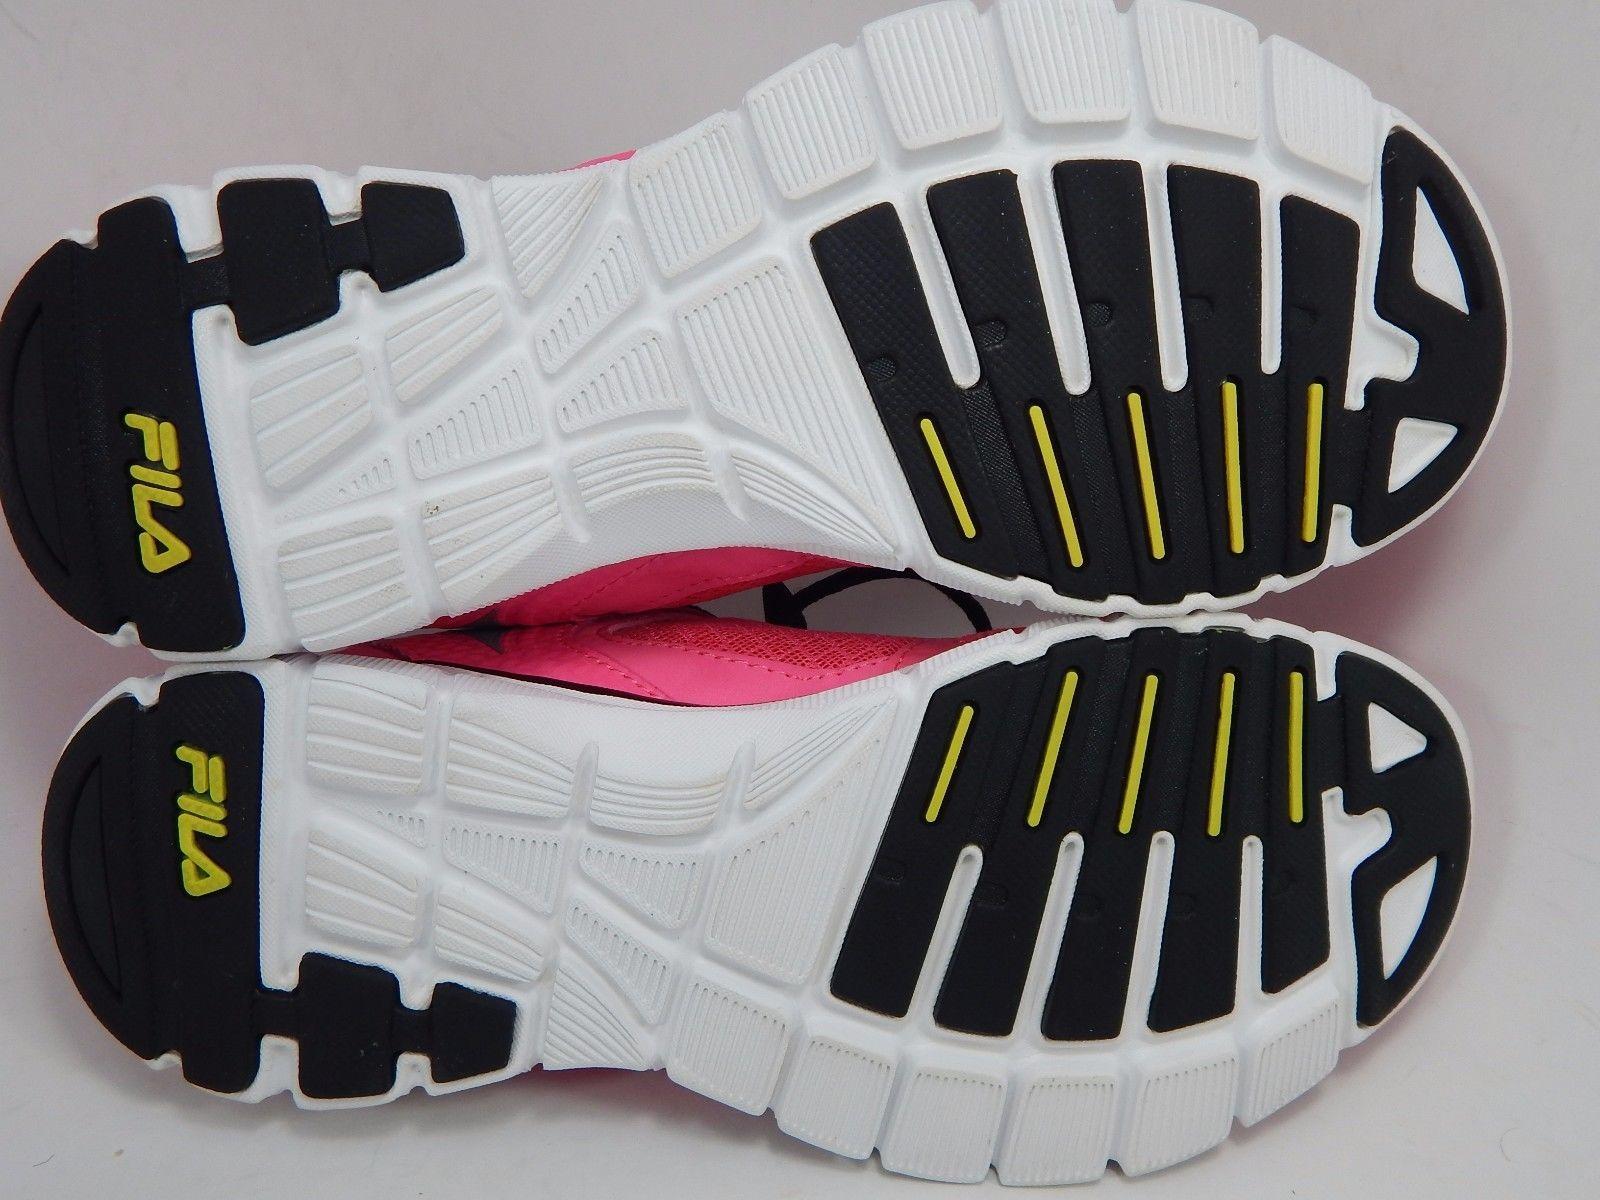 Fila Memory Synergy Knockout Women's Shoes Size US 7 M (B) EU 38 5SR20201-667